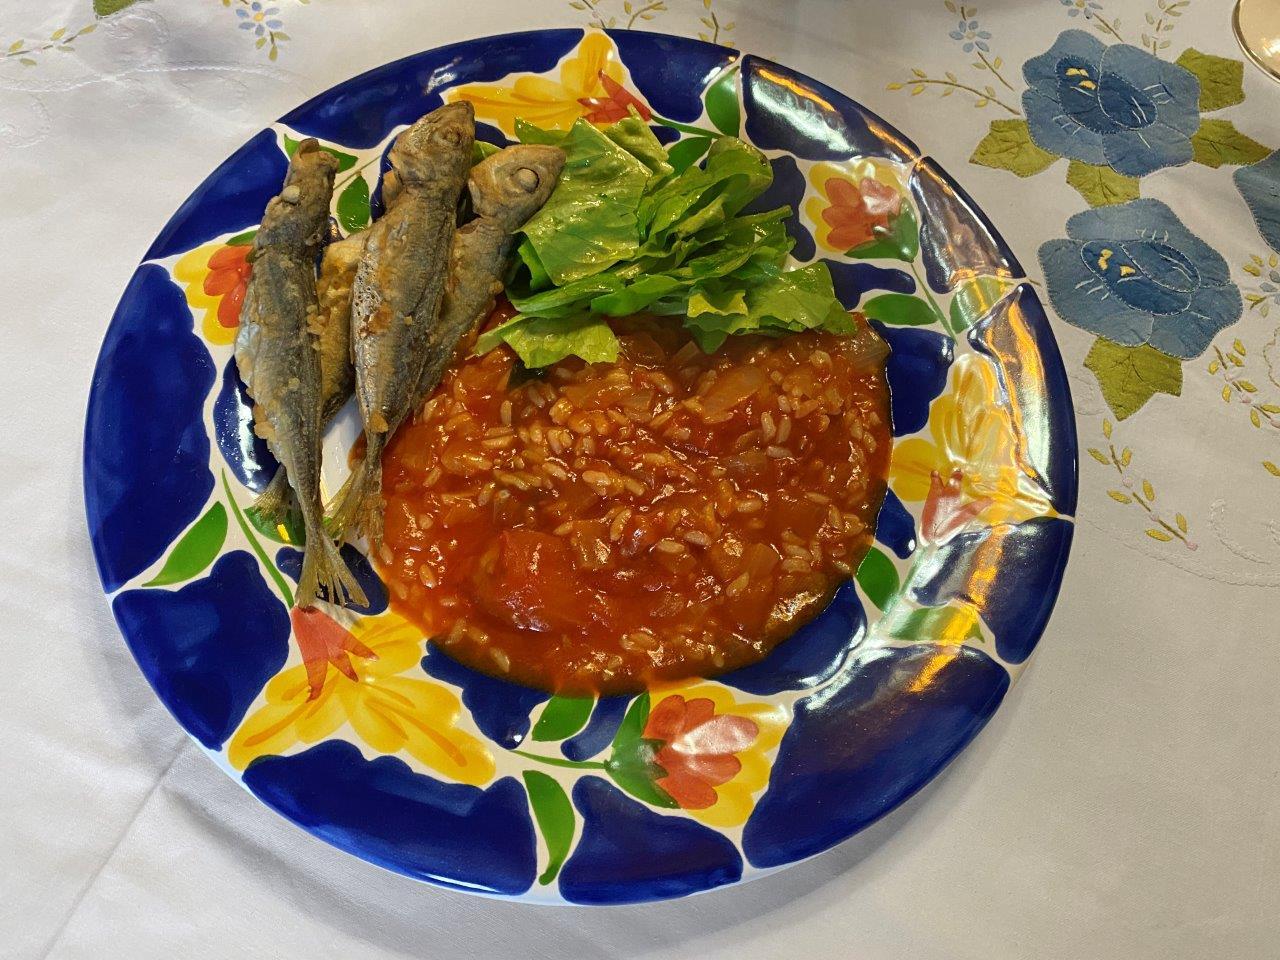 Arroz de tomate cremoso Arroz de tomate cremoso 6